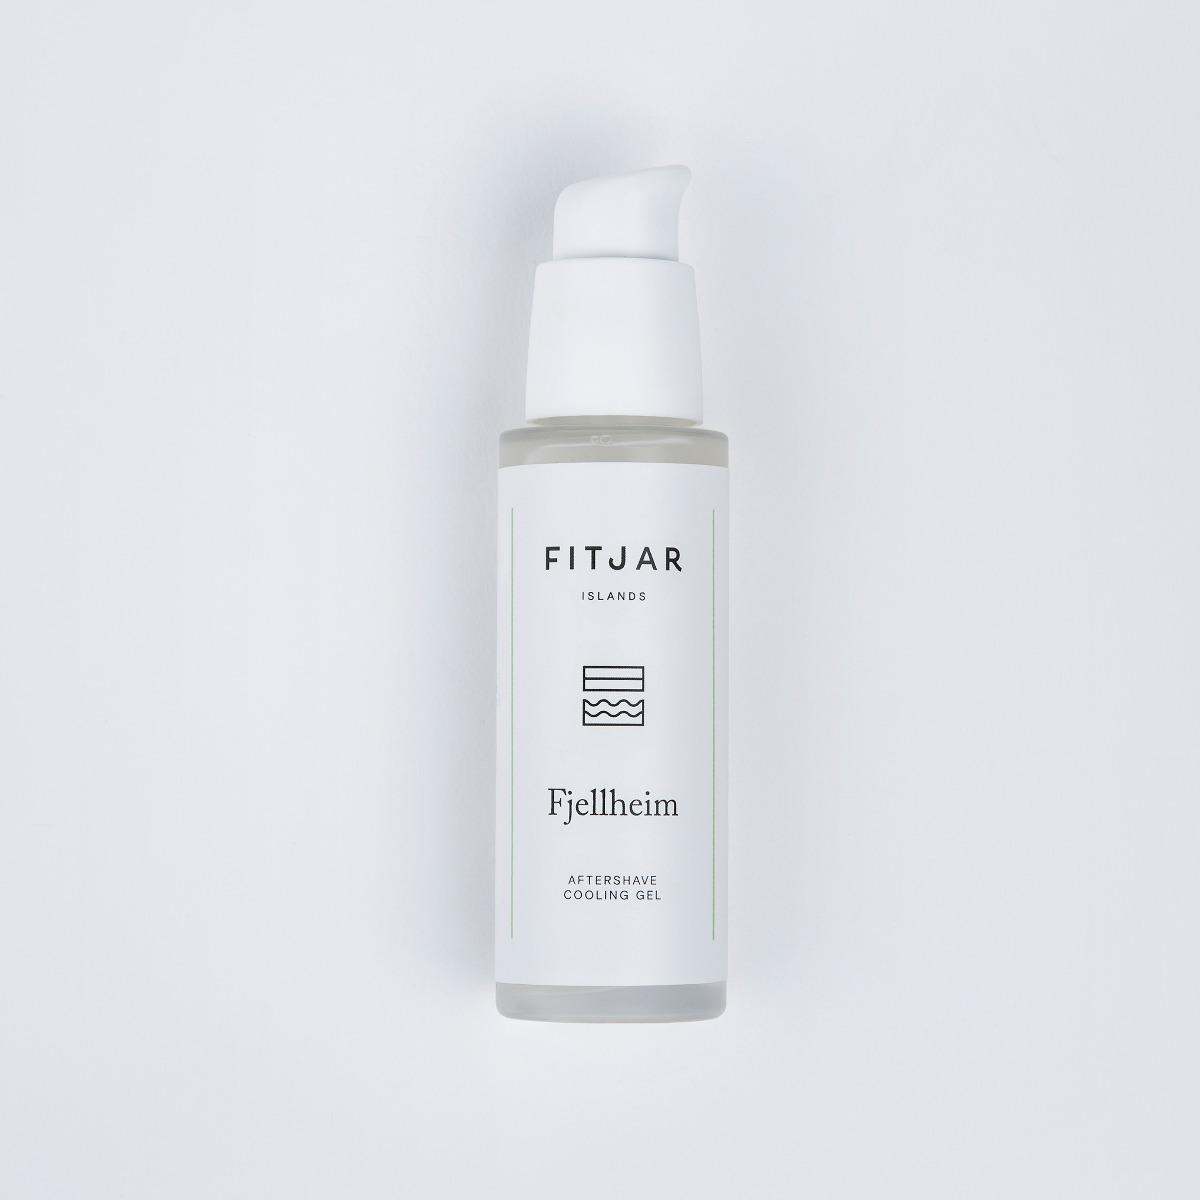 Fitjar Fjellheim Aftershave Cooling Gel 50ml OLD STOCK